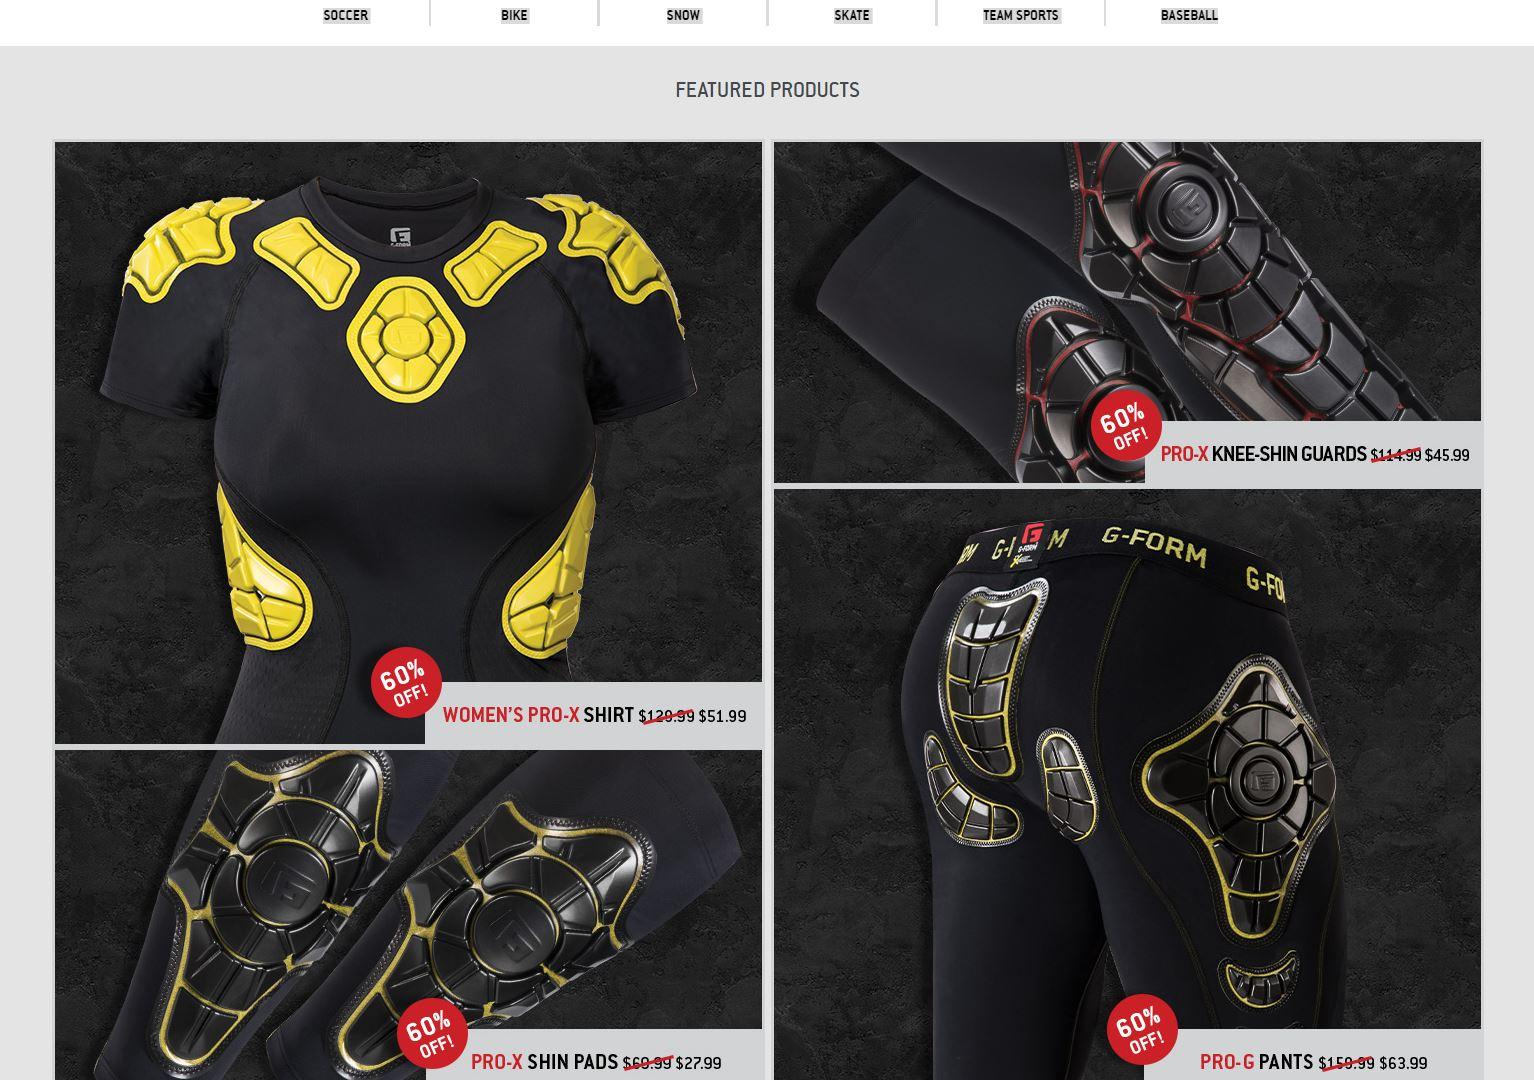 G-Form Body Armor on sale